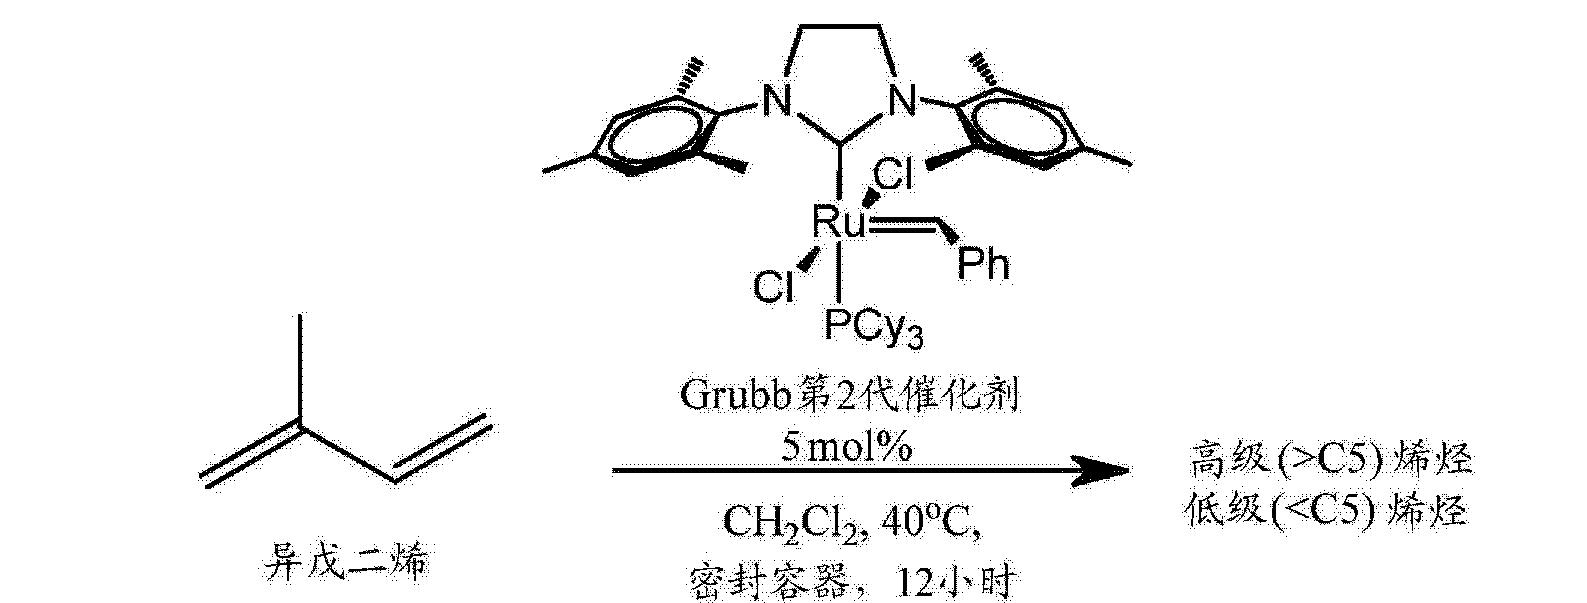 Figure CN103025688AD00501